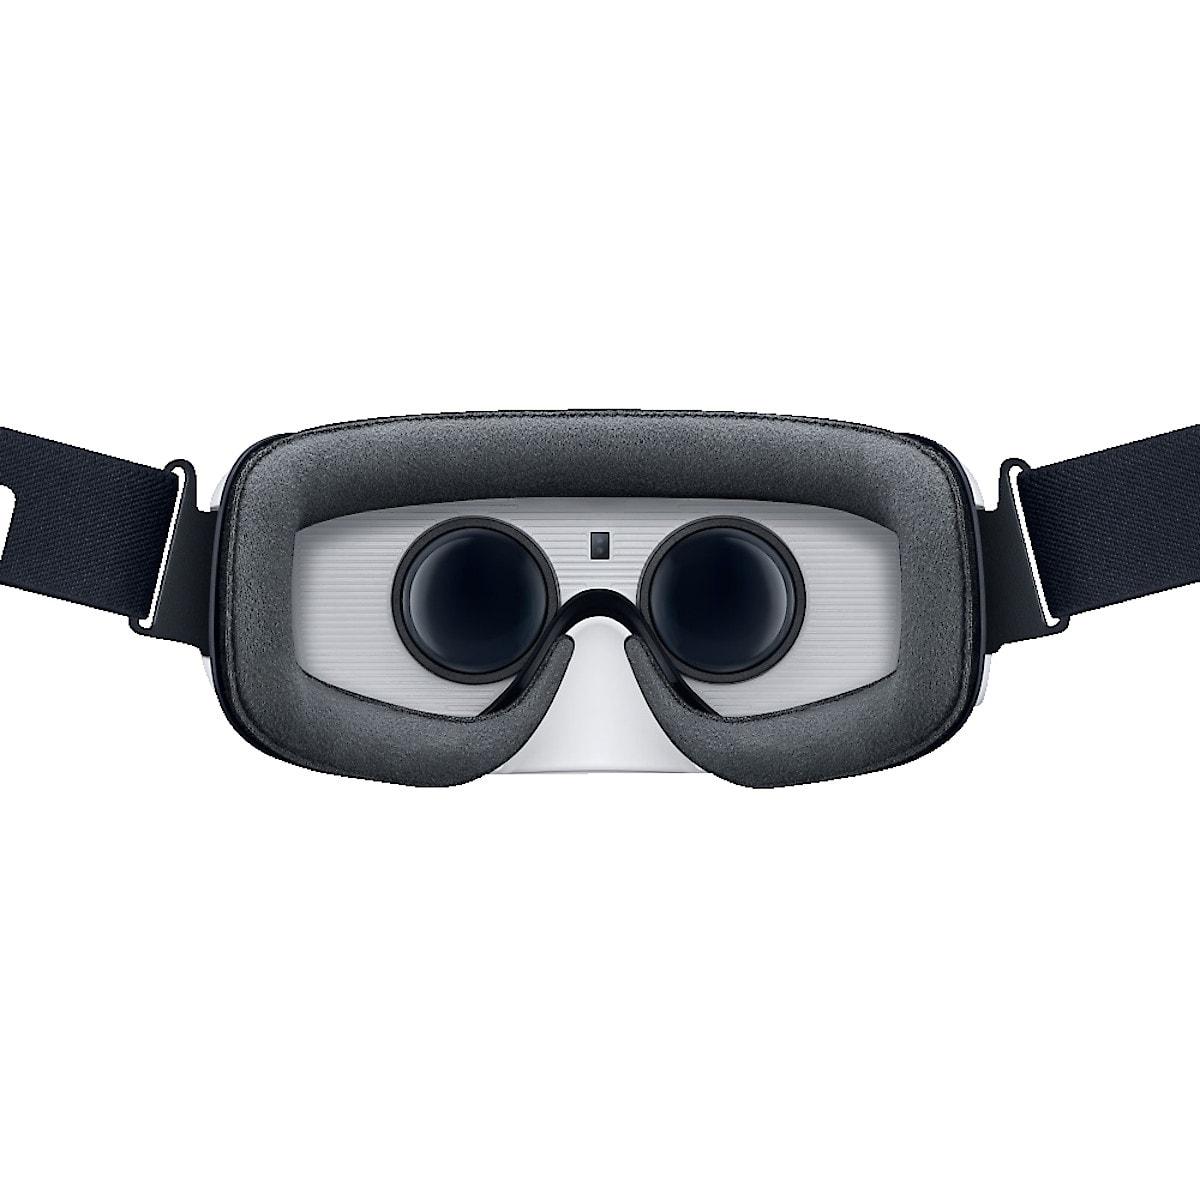 Samsung Gear SM-R322 VR-brille for smartphone